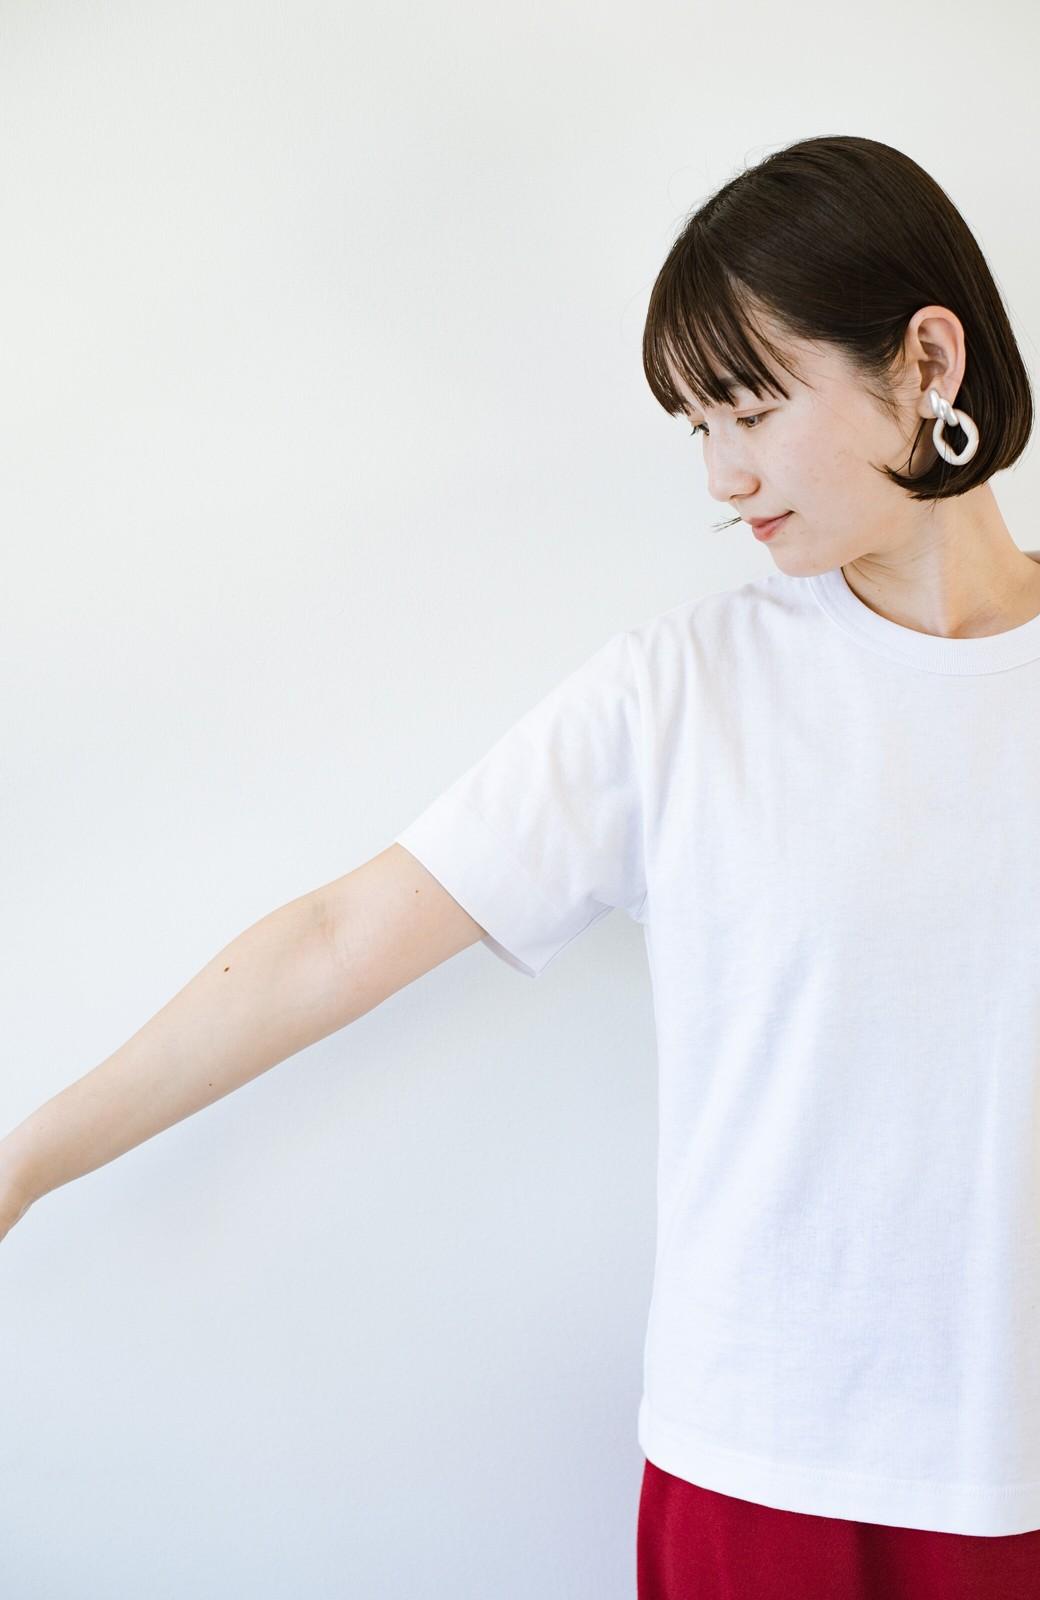 haco! さりげないロゴがコーデのポイントになるファンクションファブリックジャージークルーネックTシャツ by Healthknit <ホワイト>の商品写真5